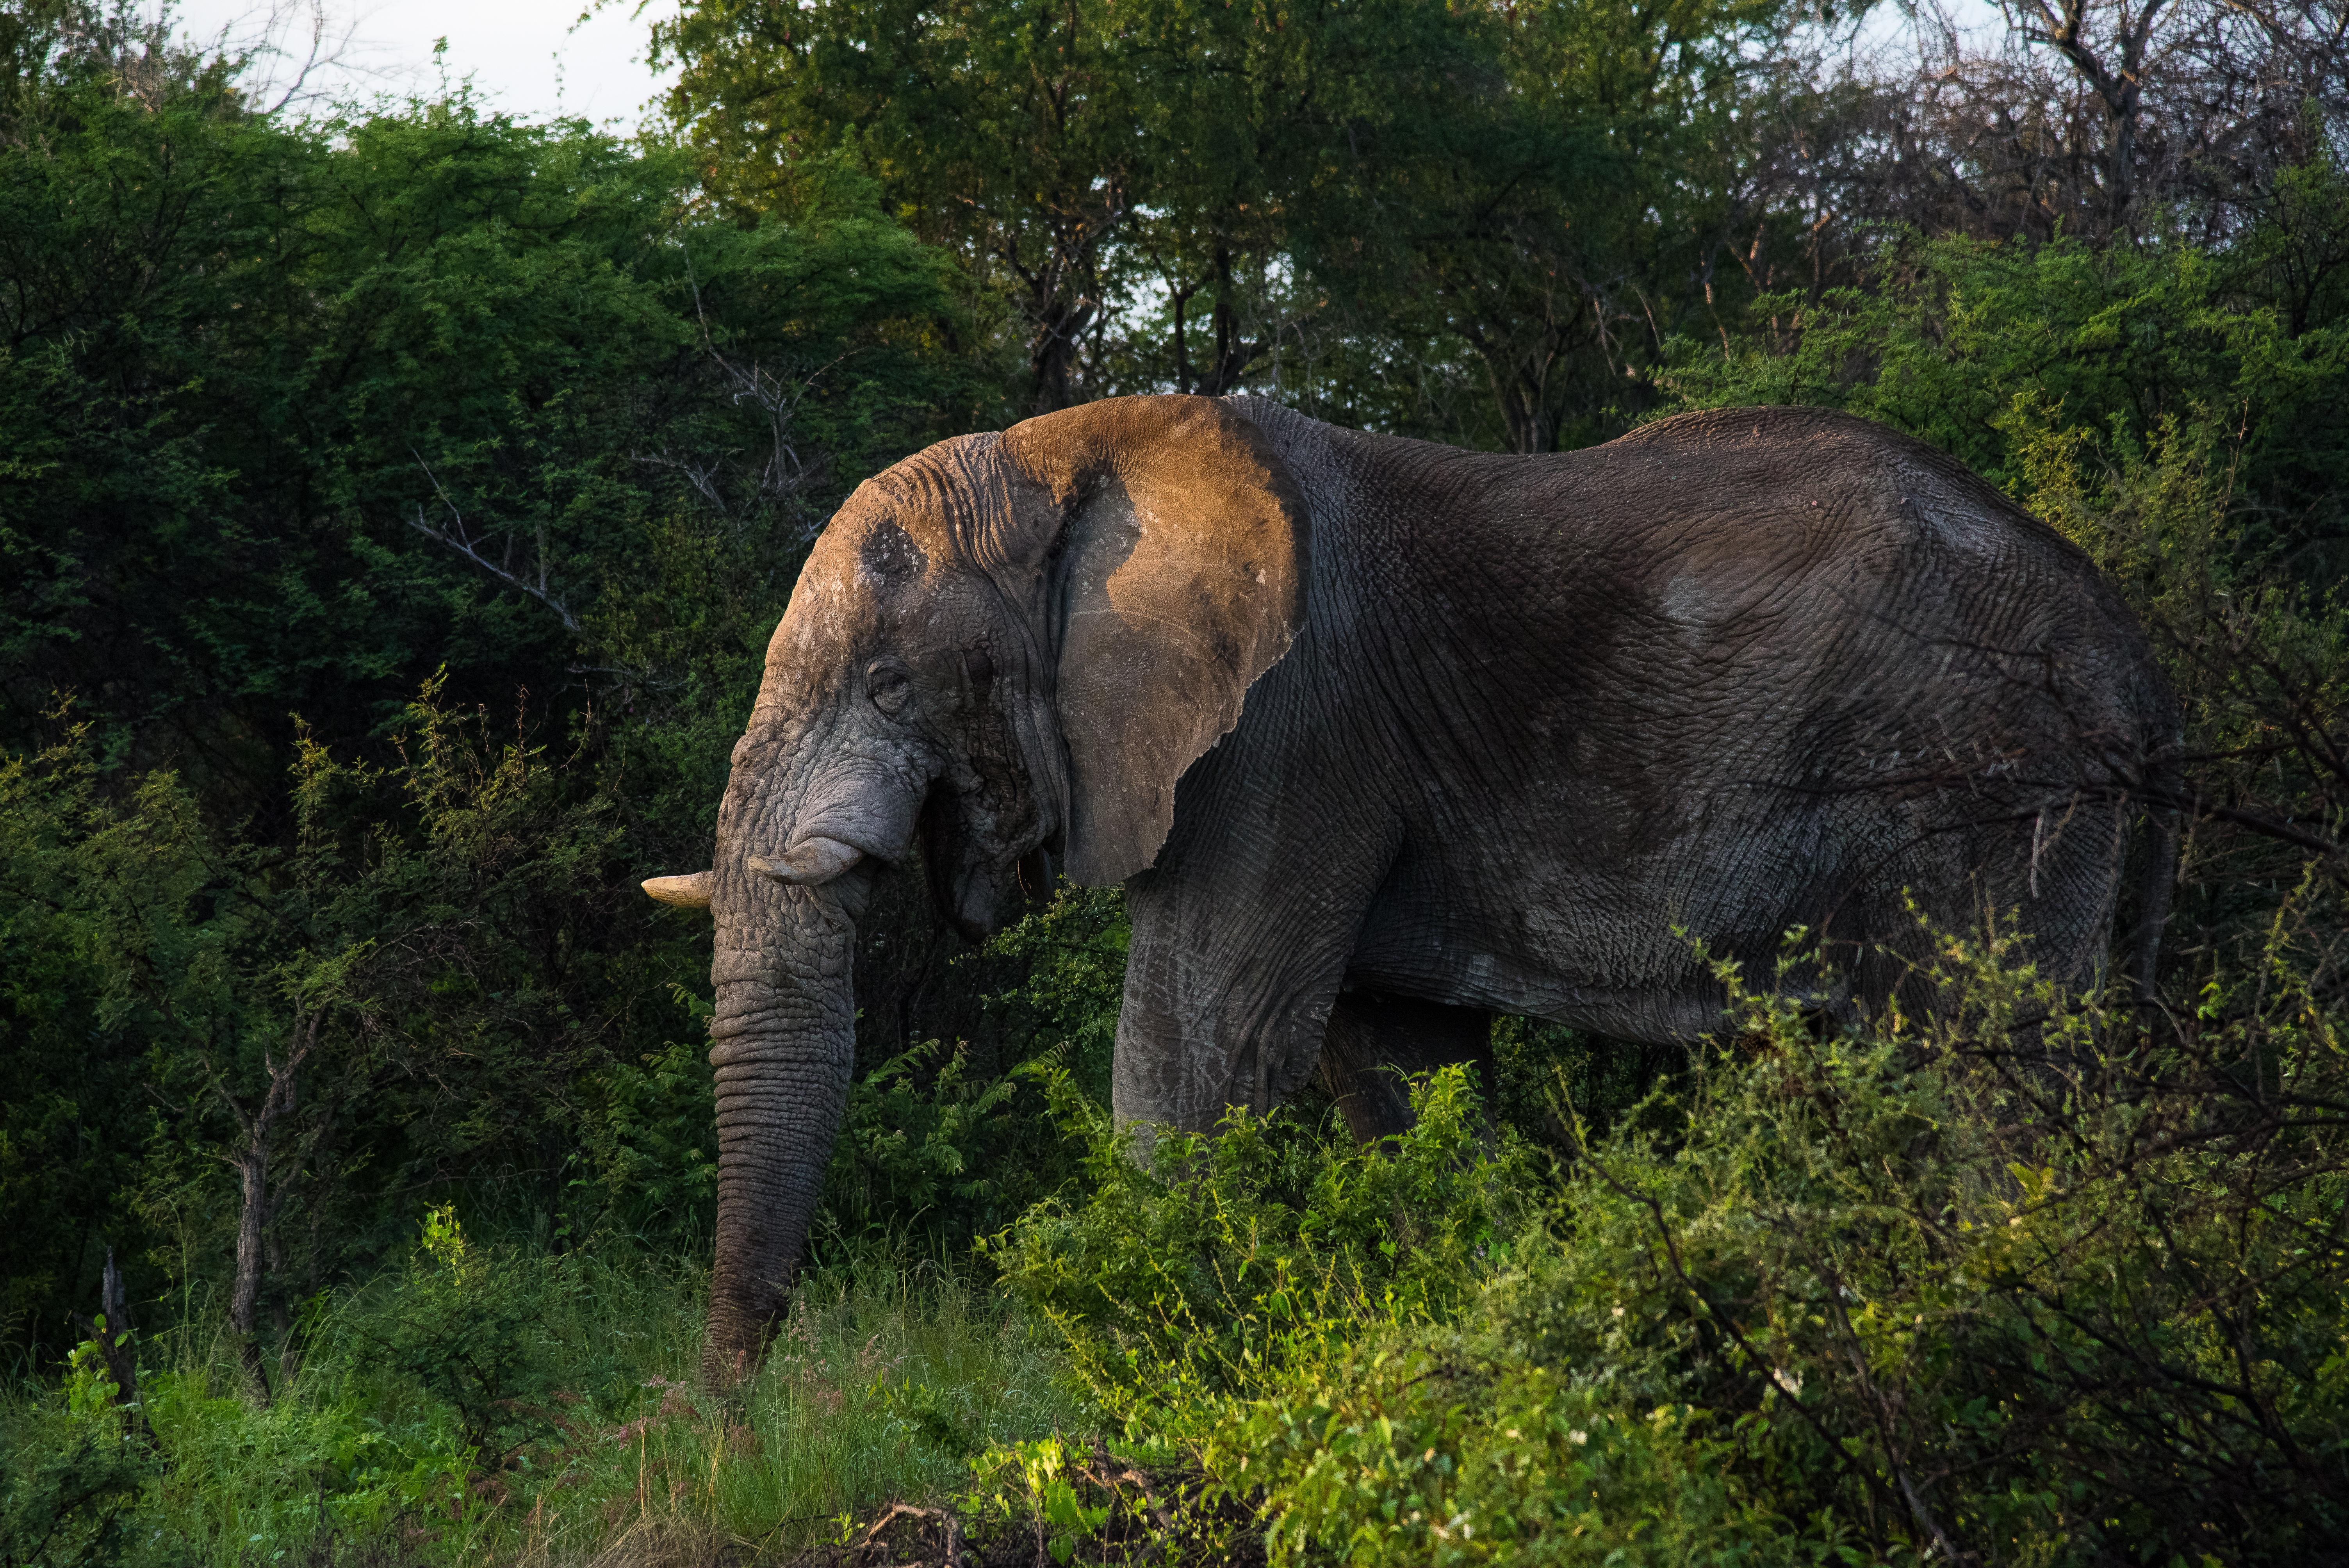 Elephnt near forest, Namibia